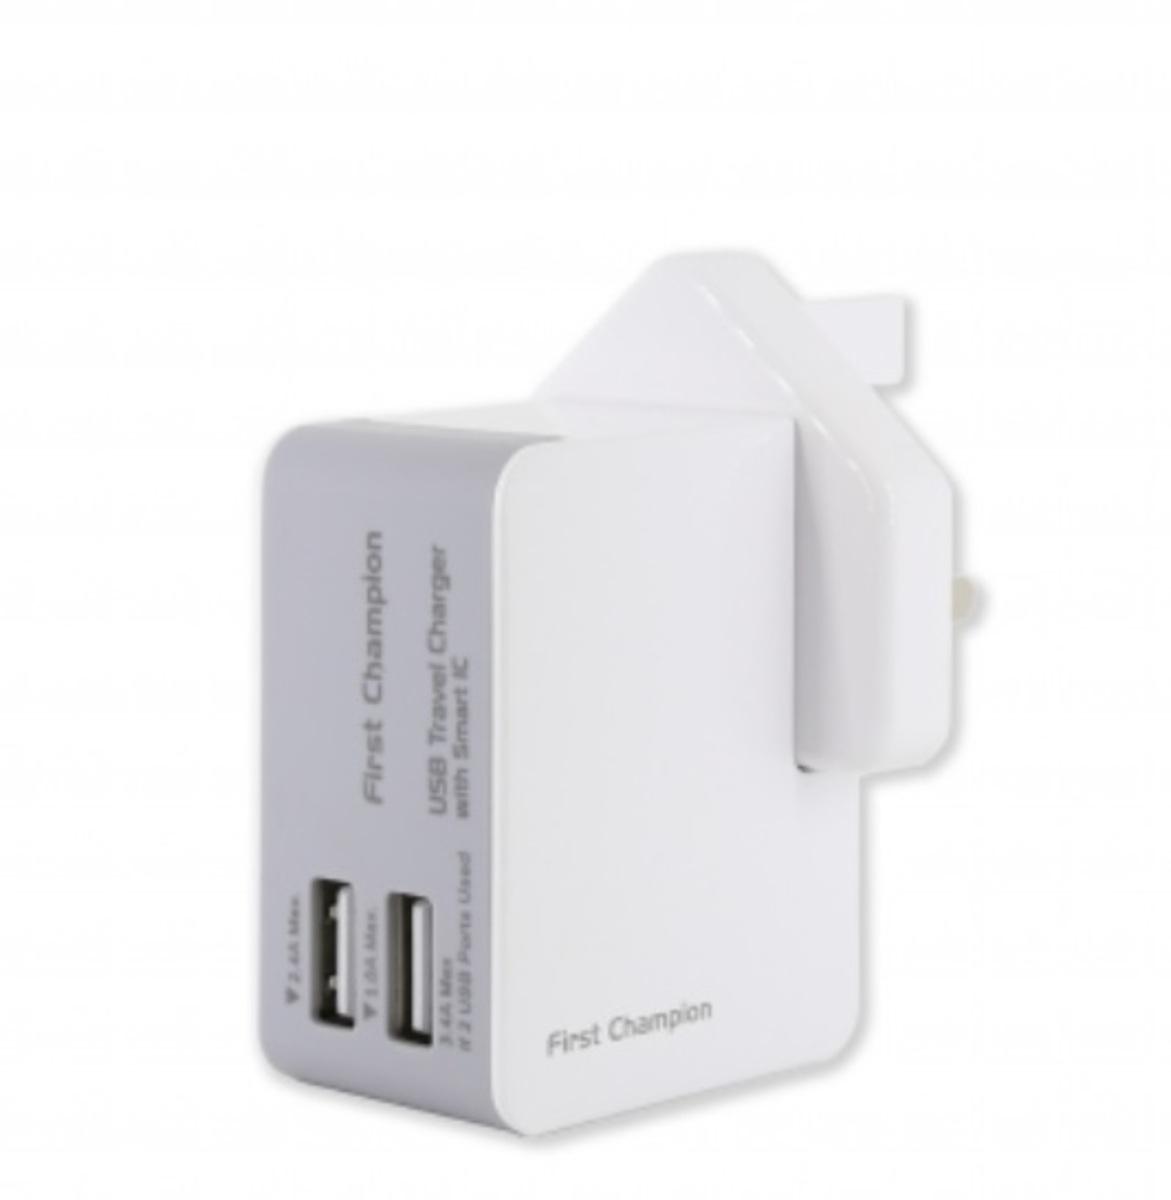 FIRST CHAMPION 2USB Ports 旅行充電器 Universal Travel chargers, FC-UTC203